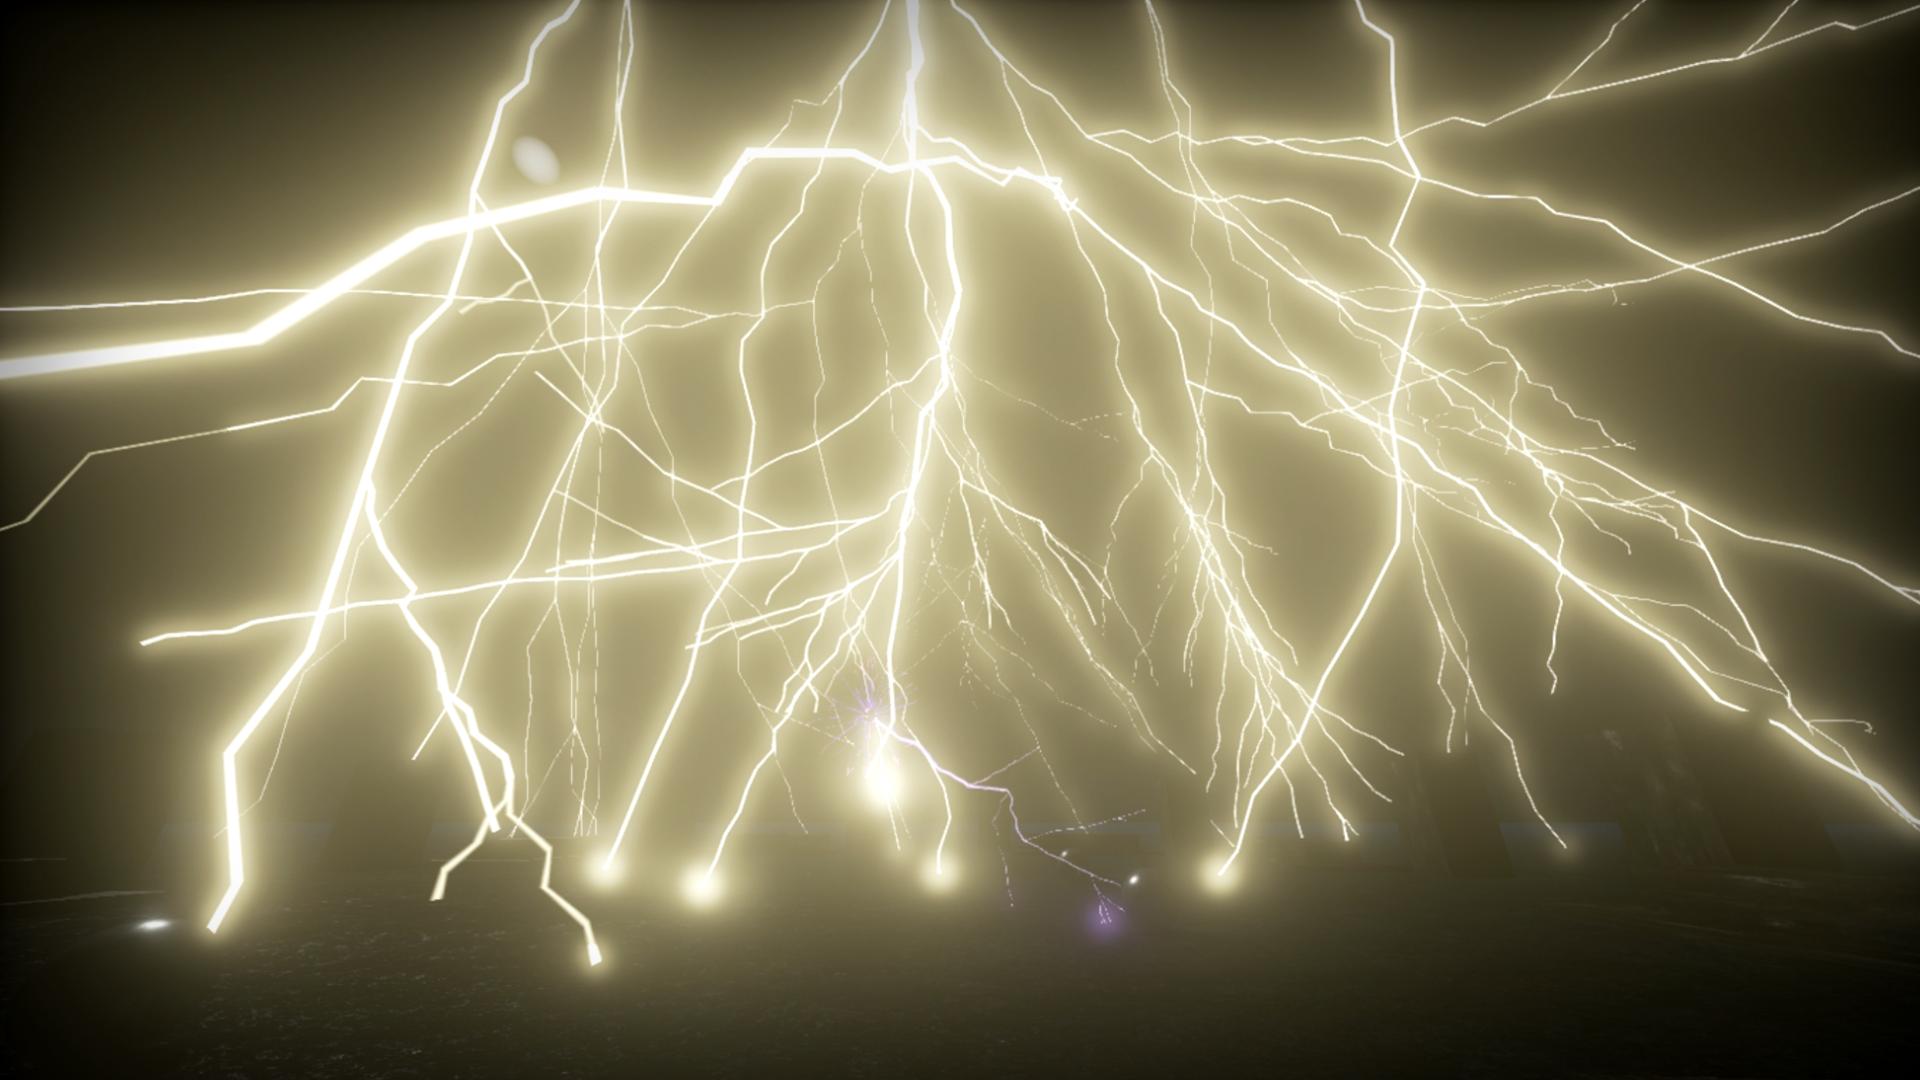 Procedural Lightning By Steven Verstoep In Fx Ue4 Marketplace